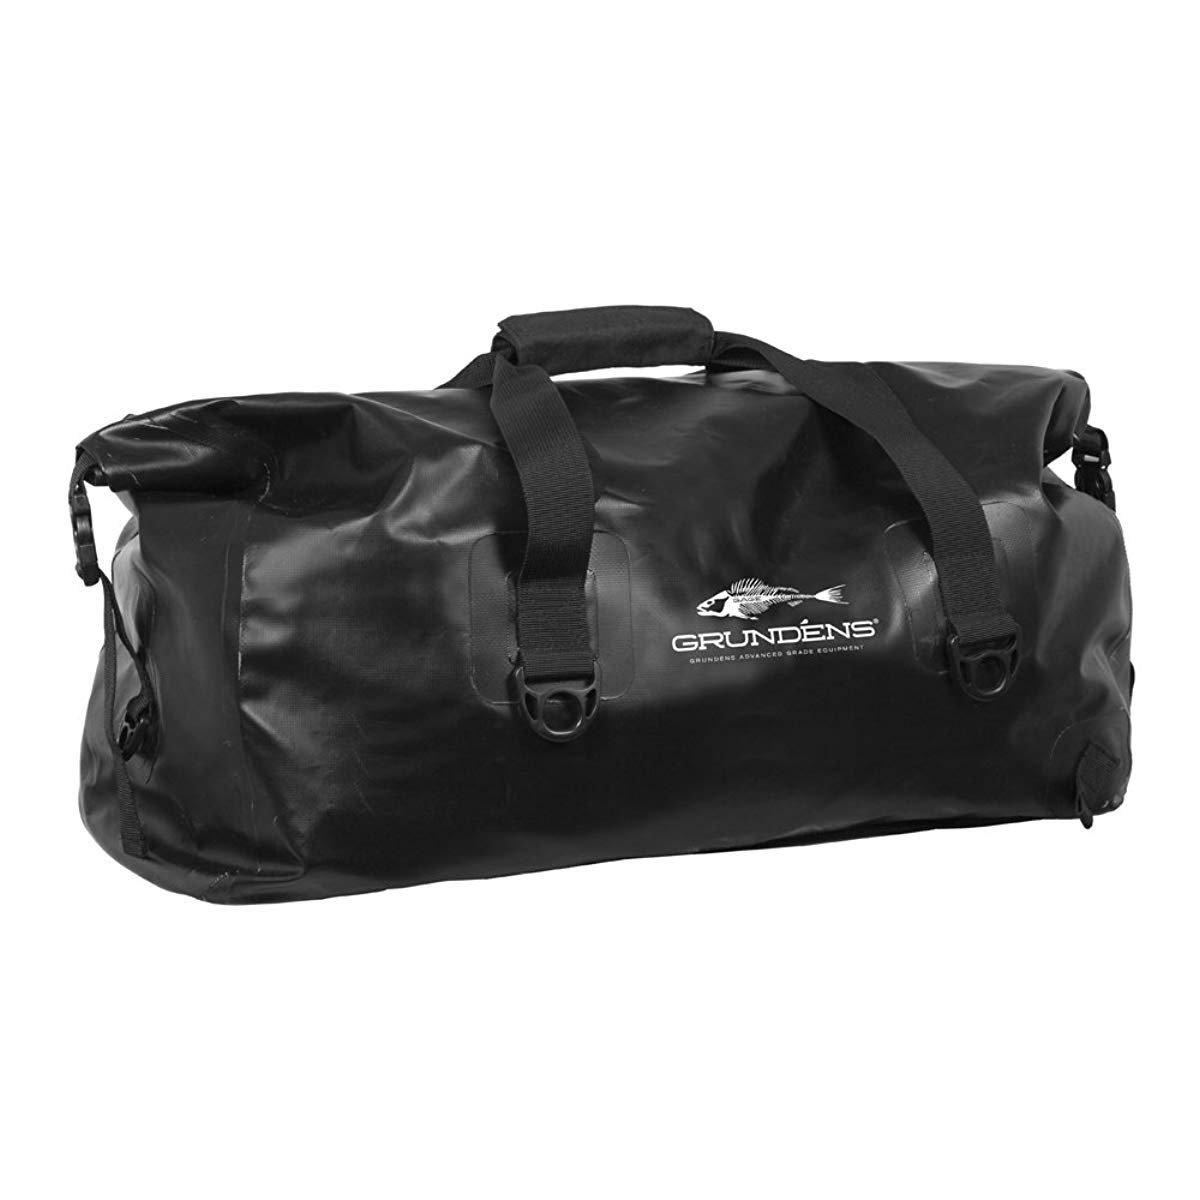 Black One Size Grundens 70043 Shore Leave 55 L Waterproof Duffel Bag